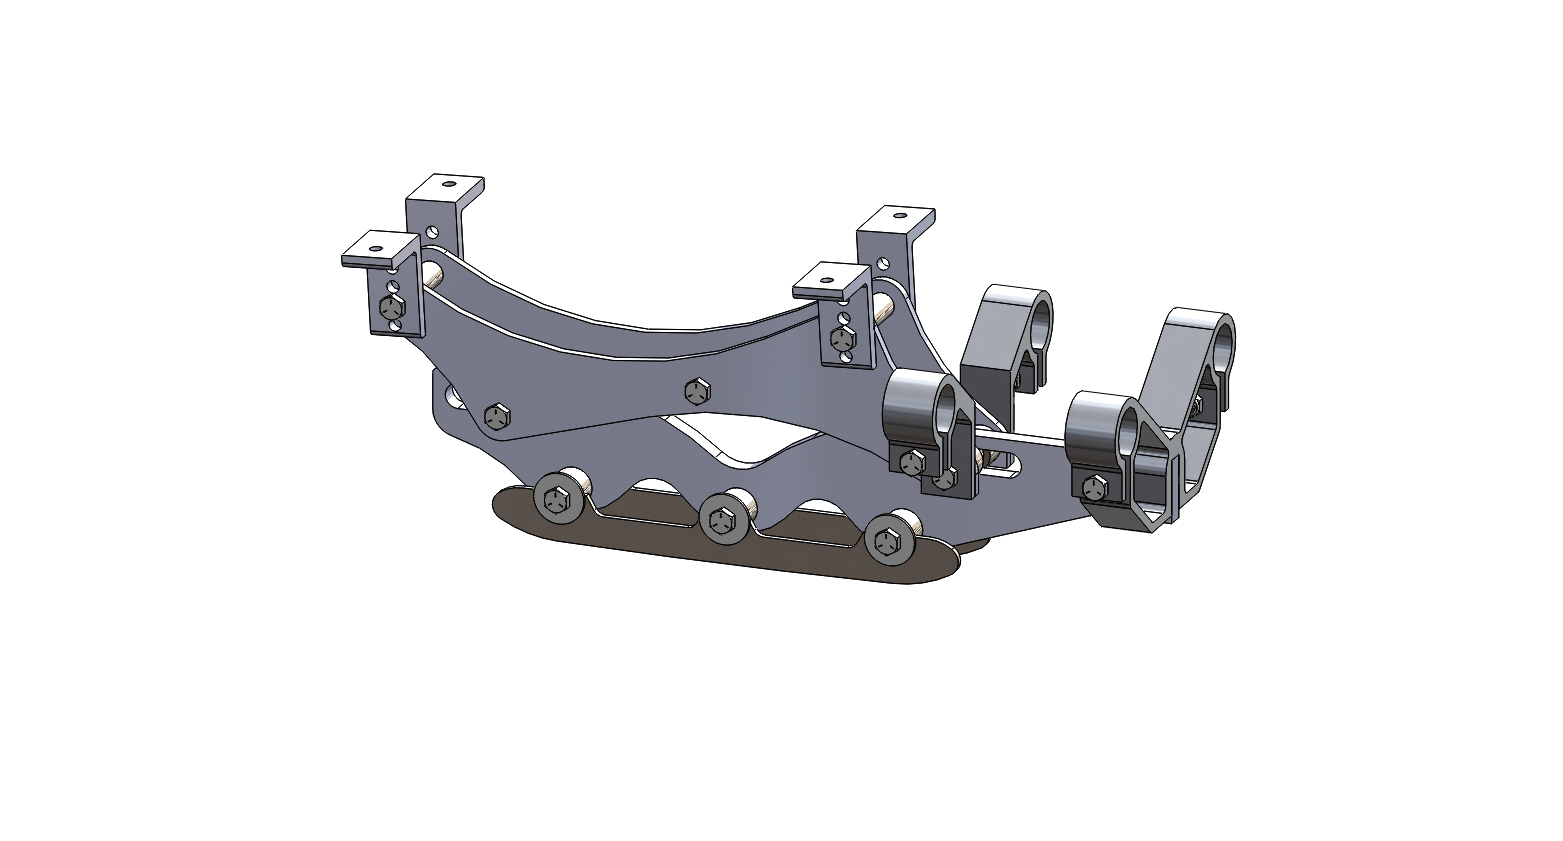 Wave Rear Frame Assembly 5 inch riser short blade